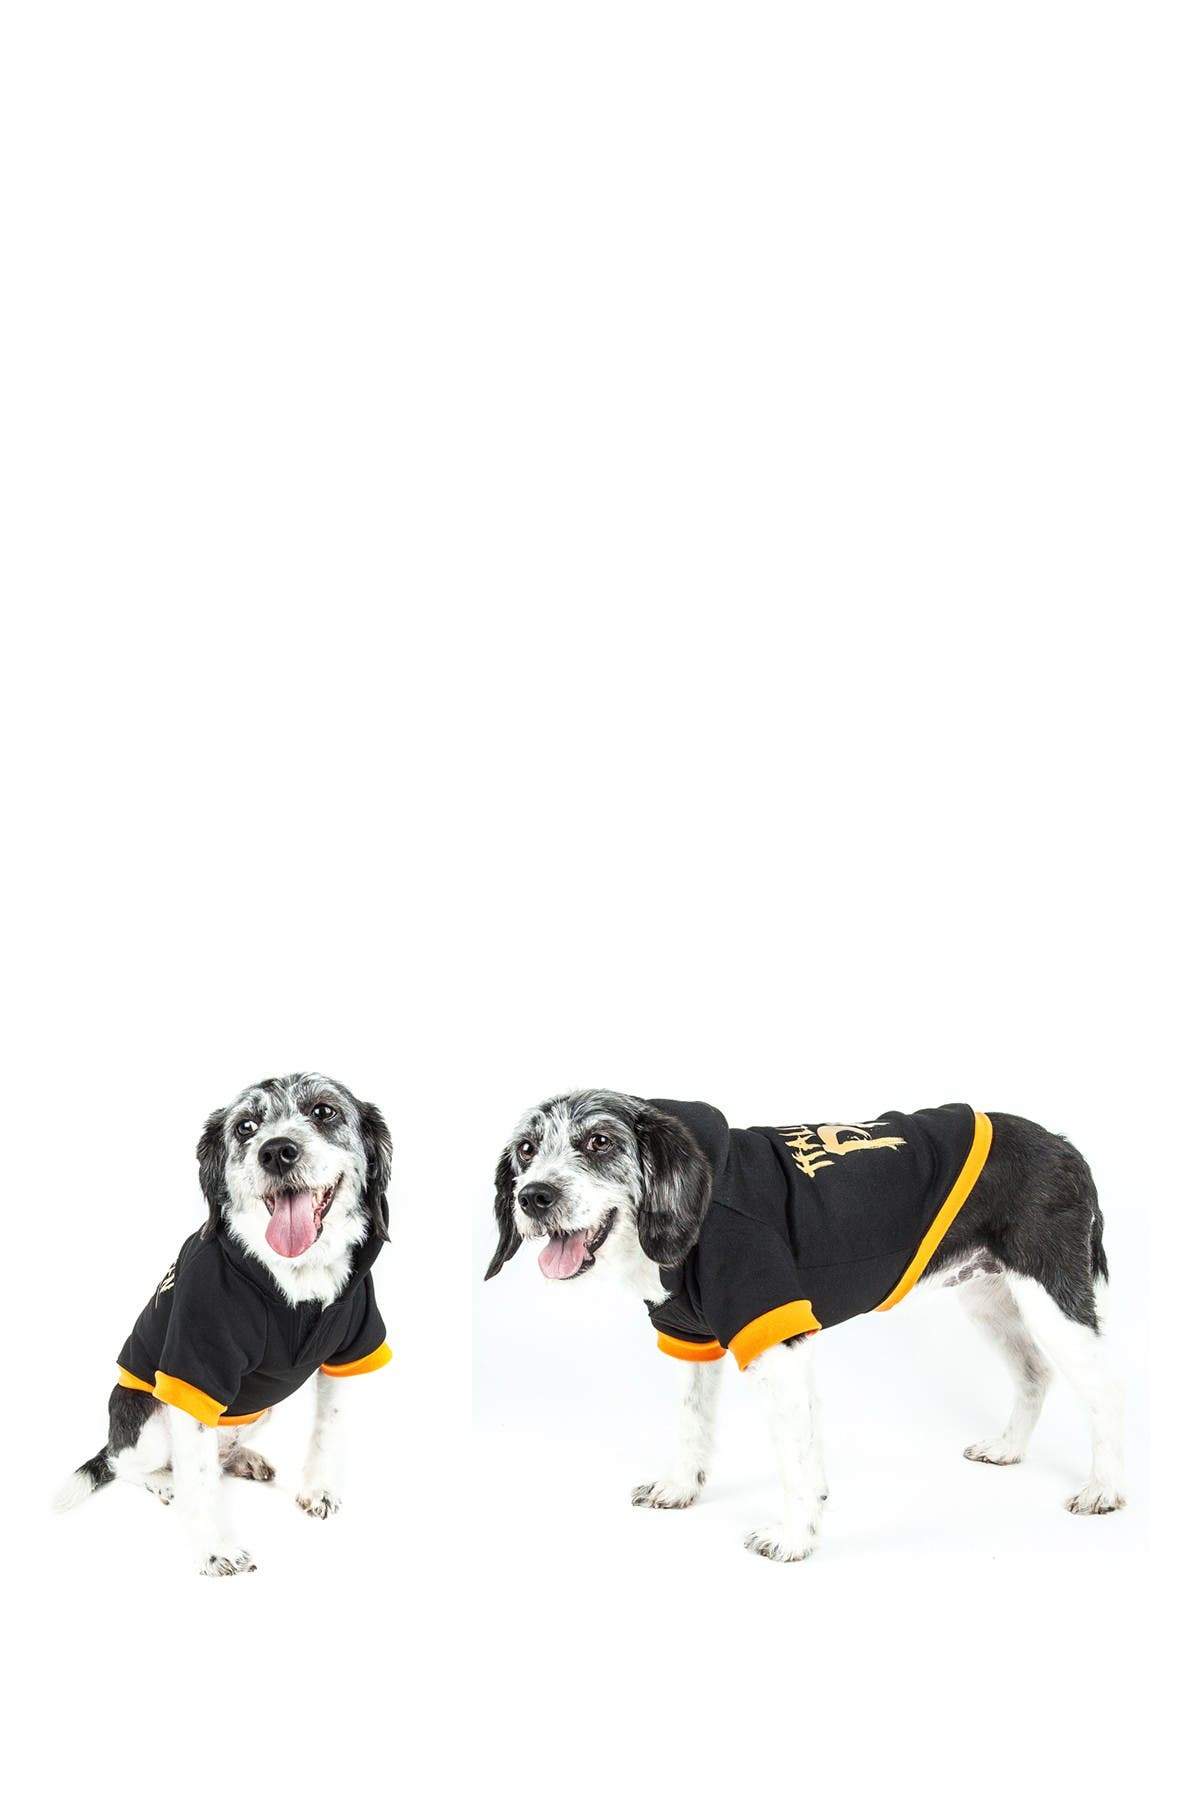 Image of PETKIT Pet Life LED Lighting Halloween Party Hooded Sweater Pet Costume - Large